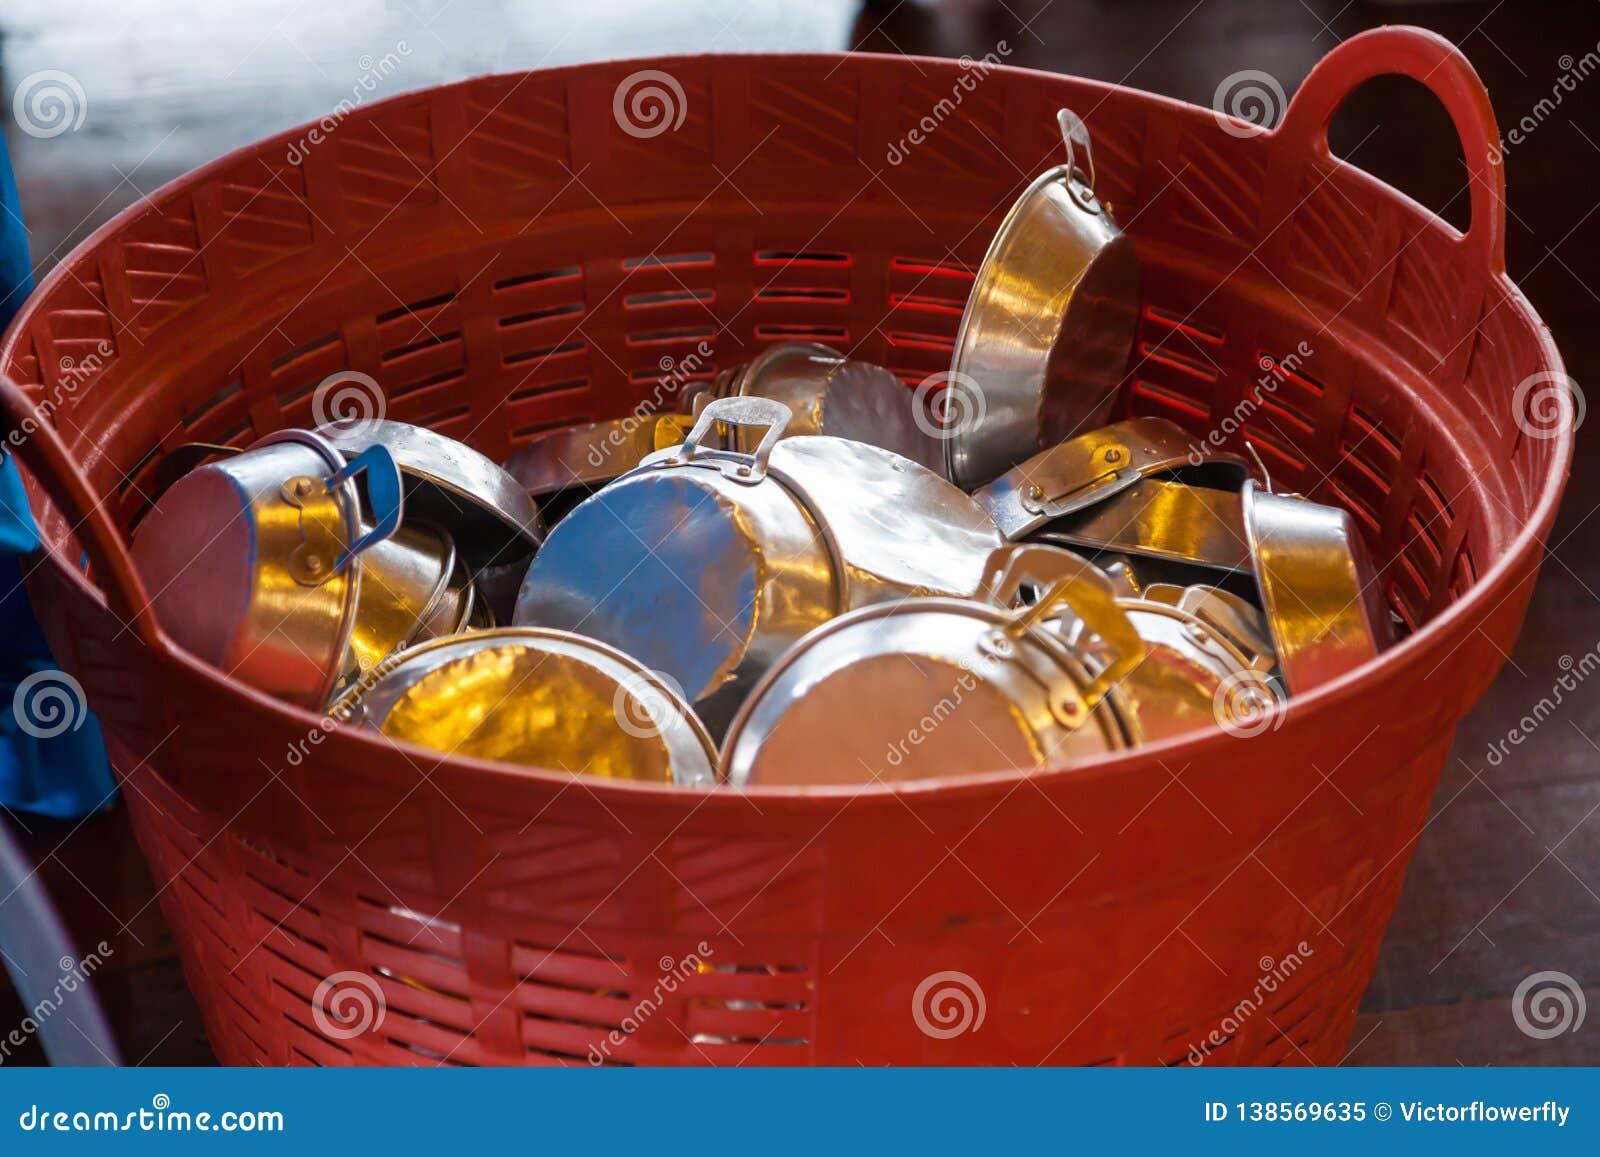 Saucepans casserole, cooking vessel with handle kept in basket in kitchen warehouse storage. Food Industry Utensils, Kitchenware